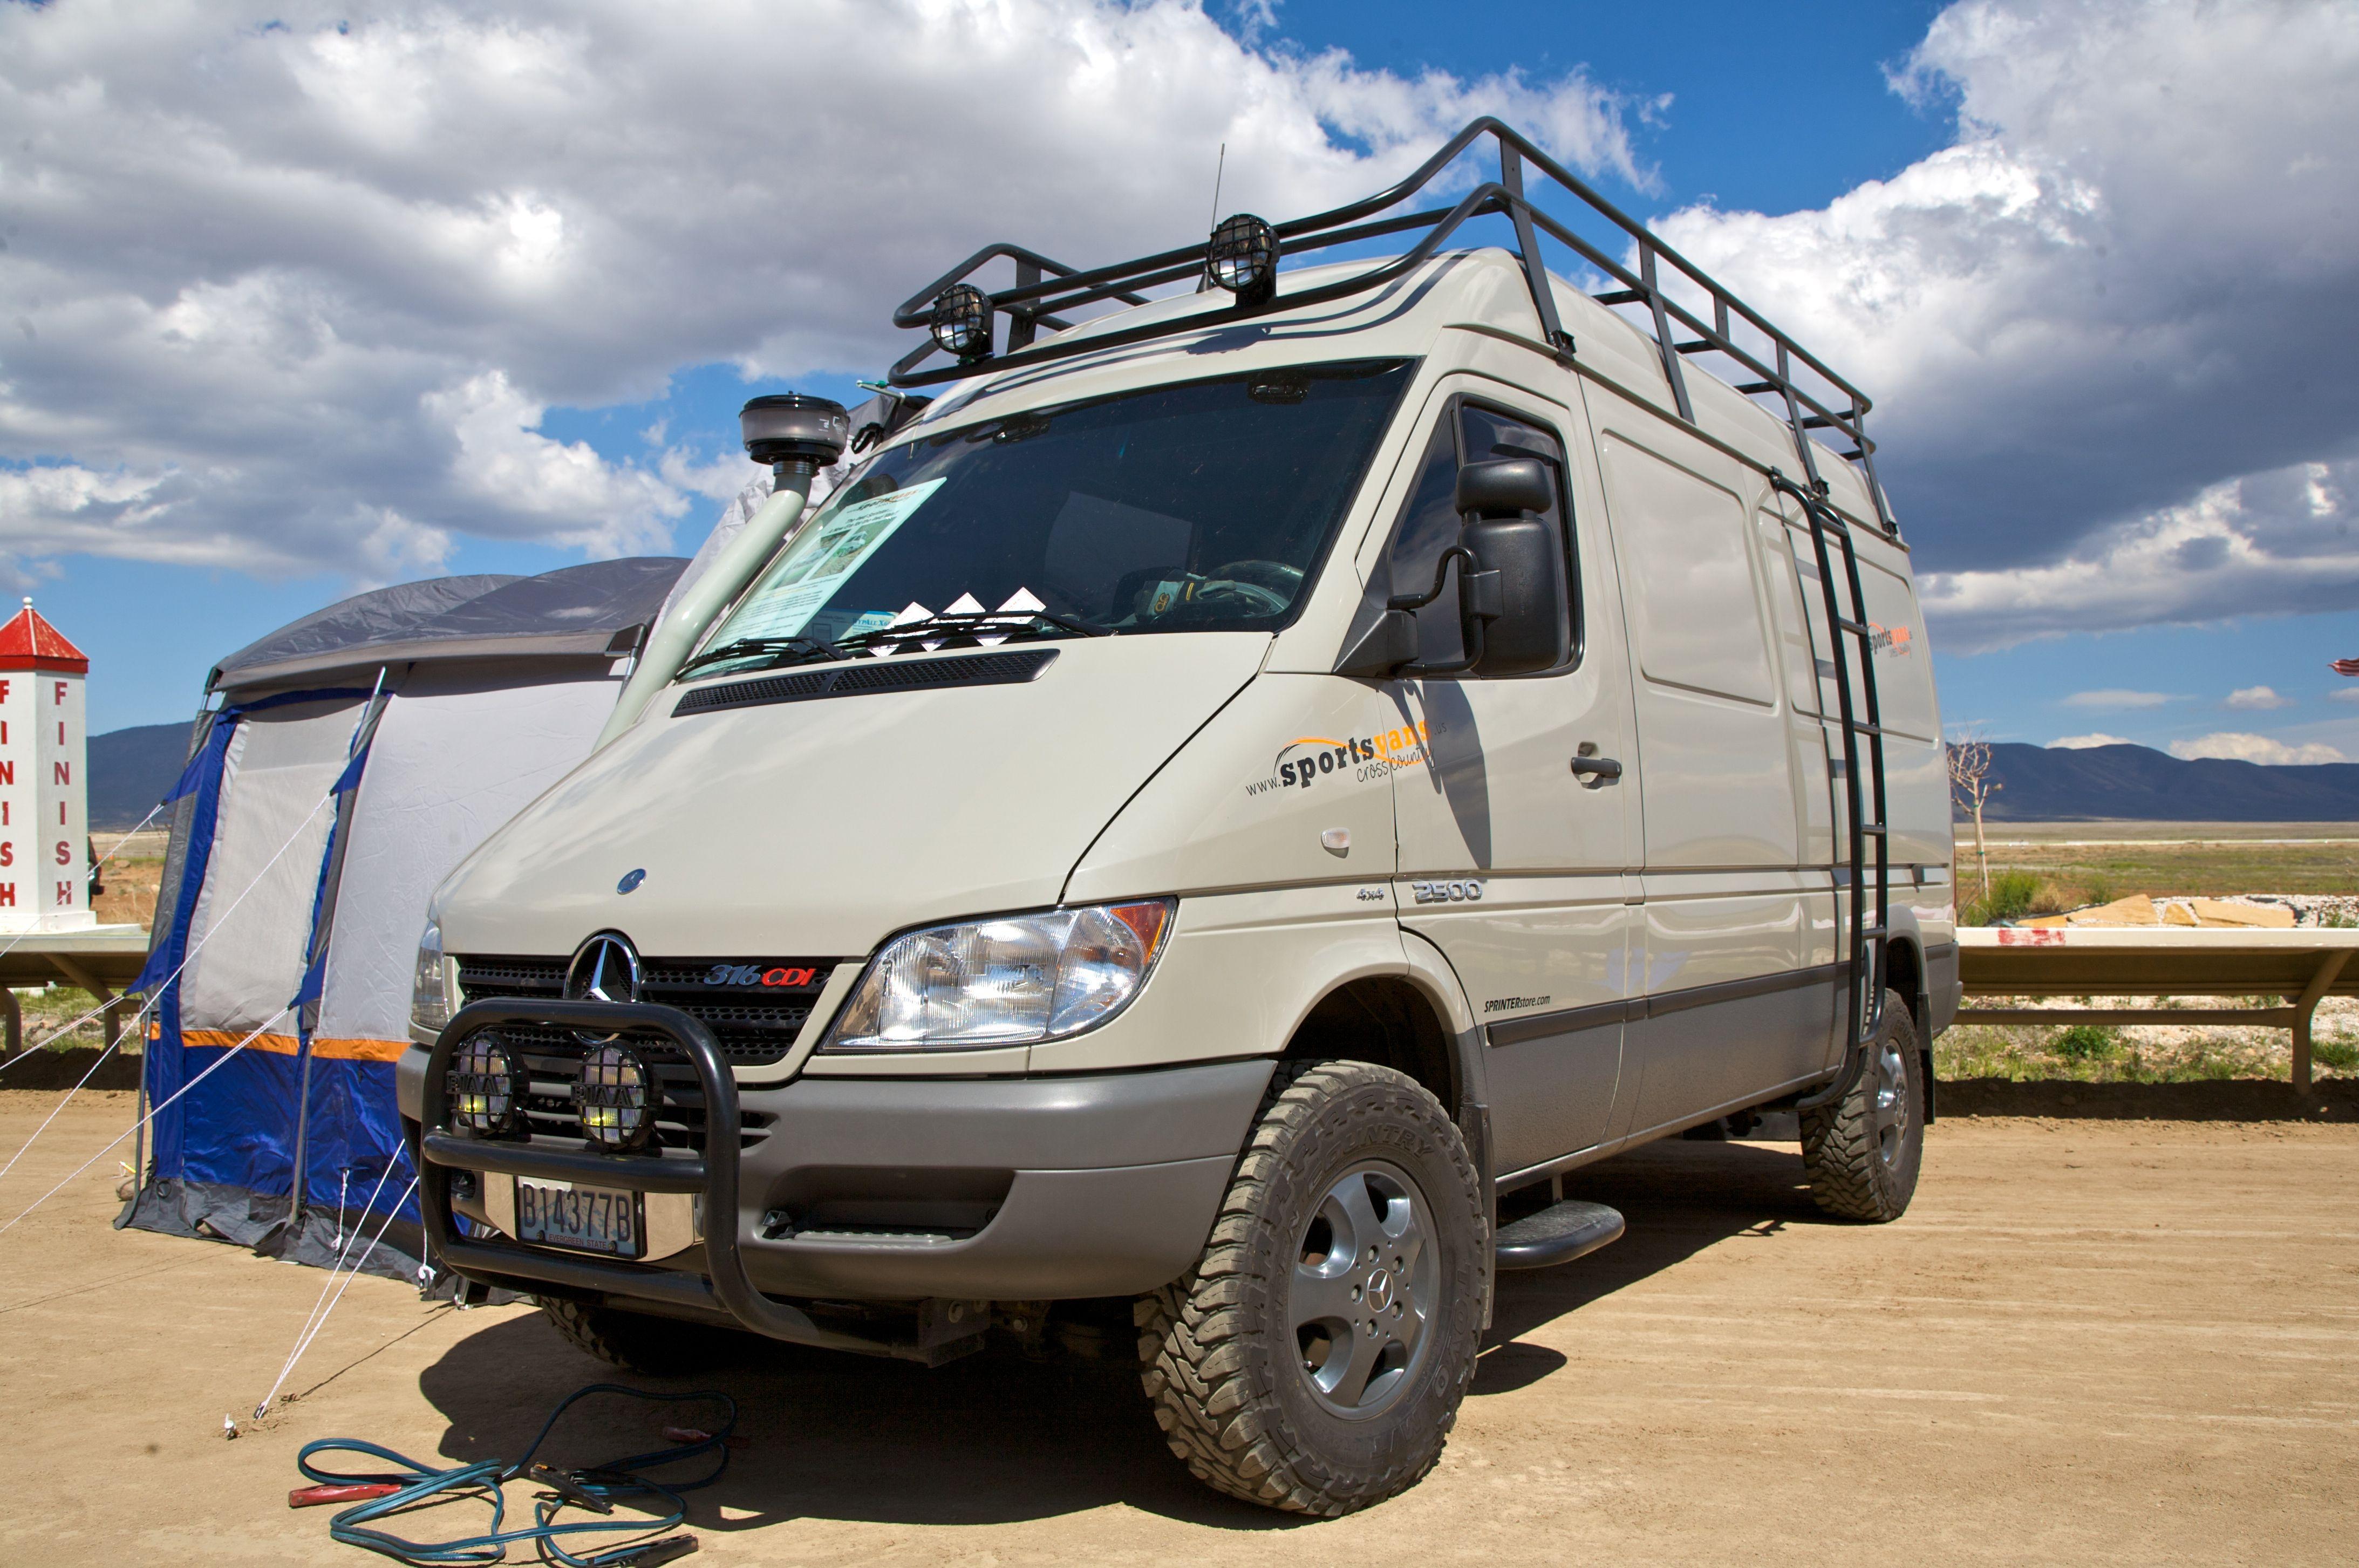 mercedes indpendent cs vehicle motorhome benz time full on for sprinter reisemobile rv independent sale